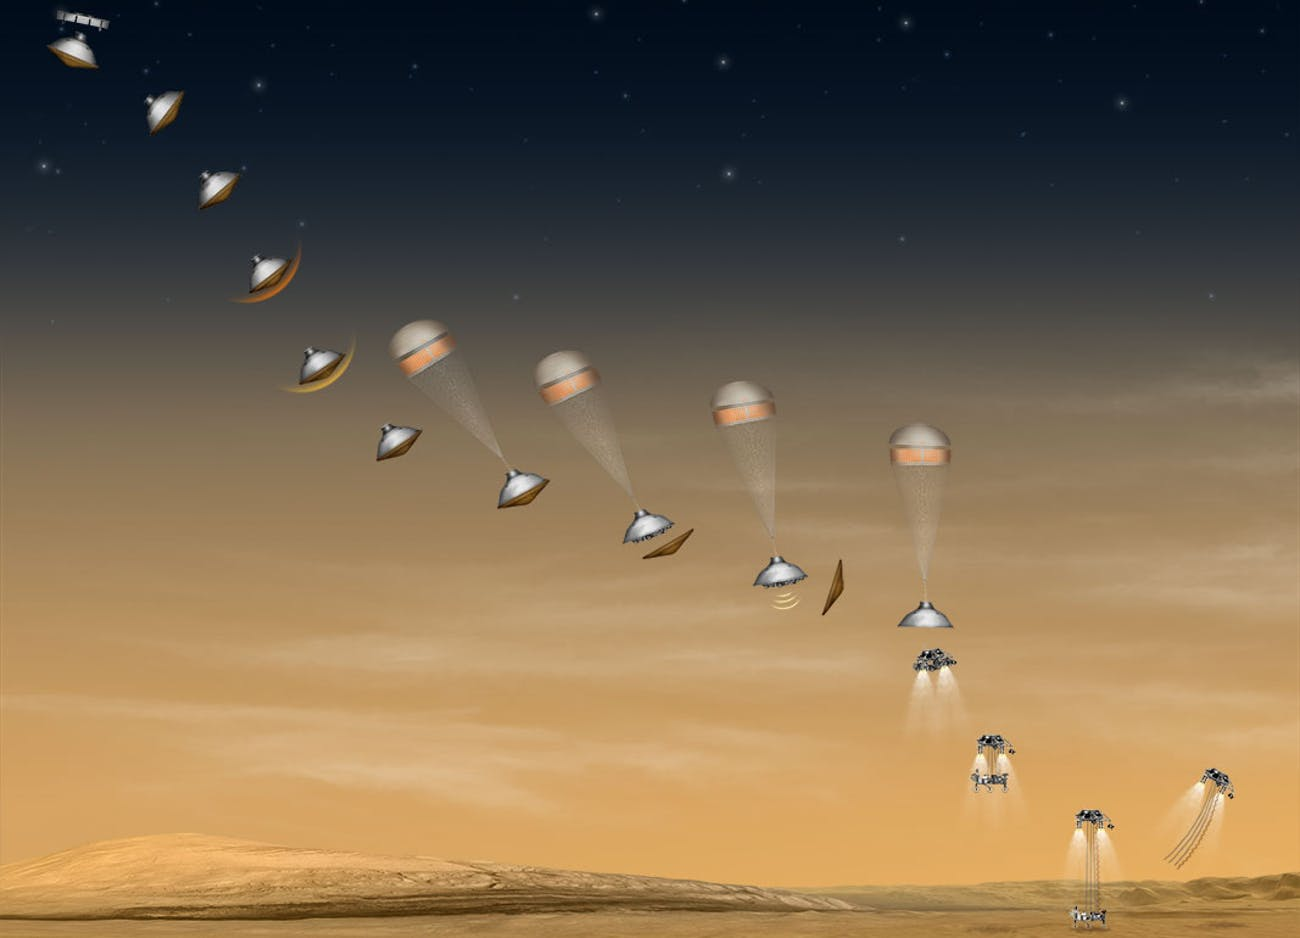 Mars entry descent landing